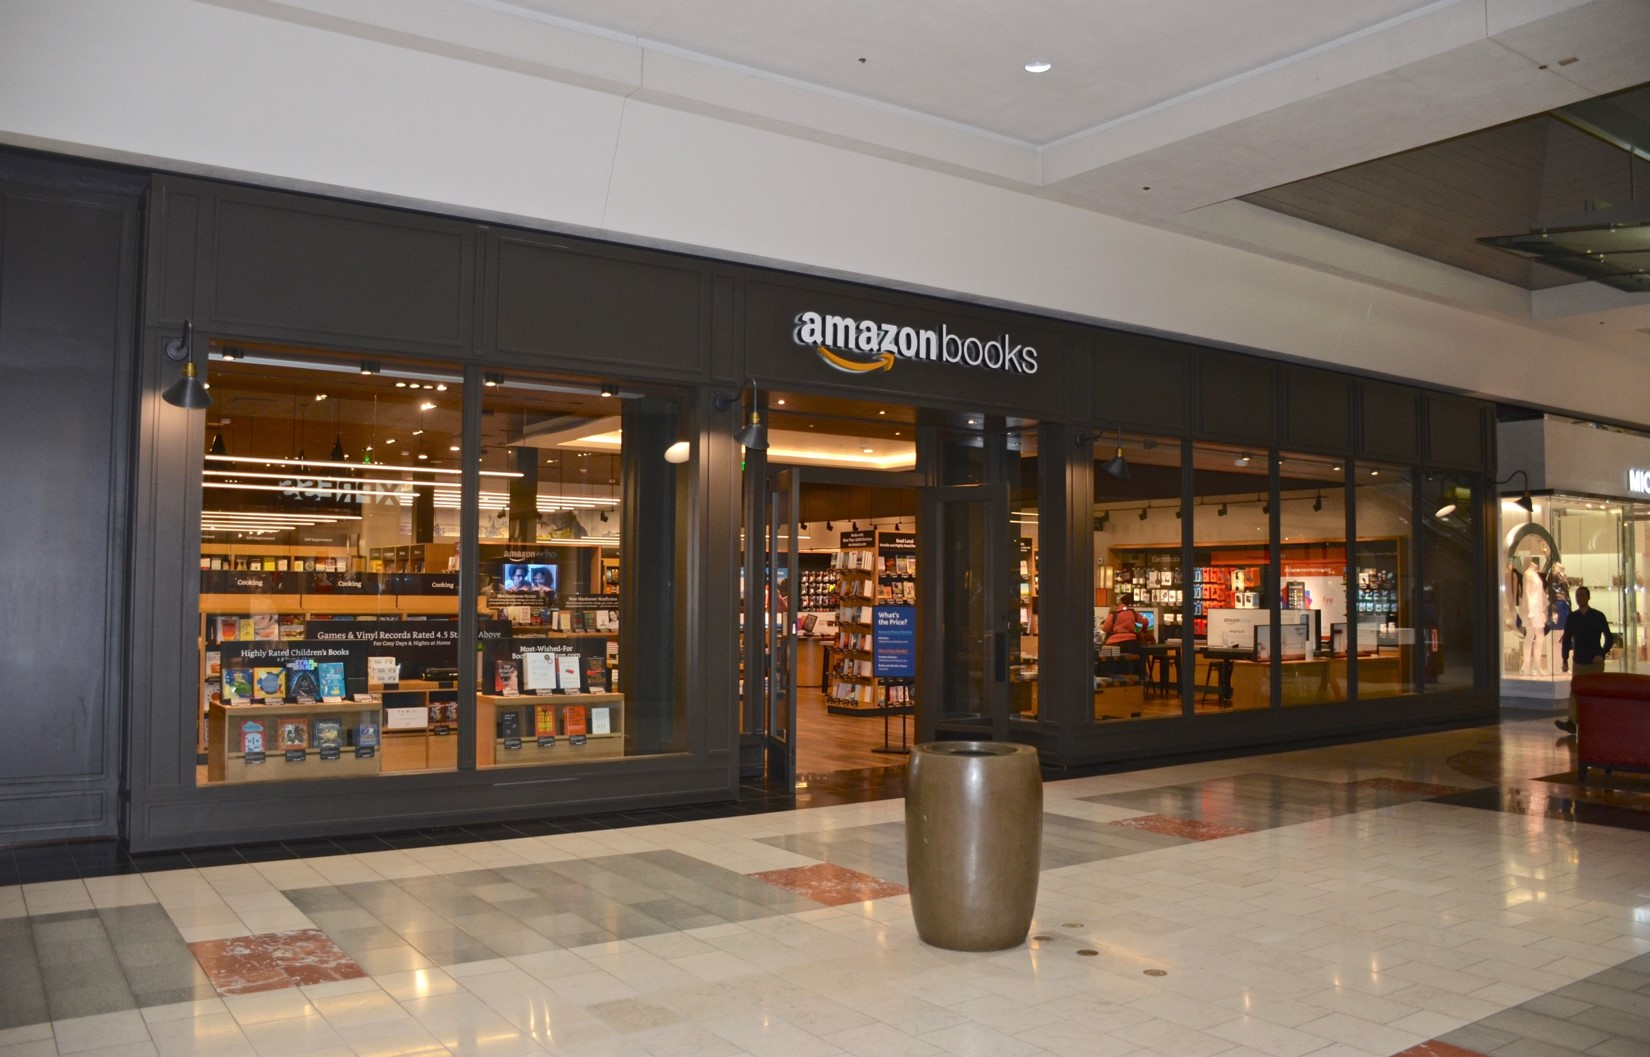 Amazon_Books_at_Washington_Square_-_Tigard,_Oregon_(2017) compressed.jpg